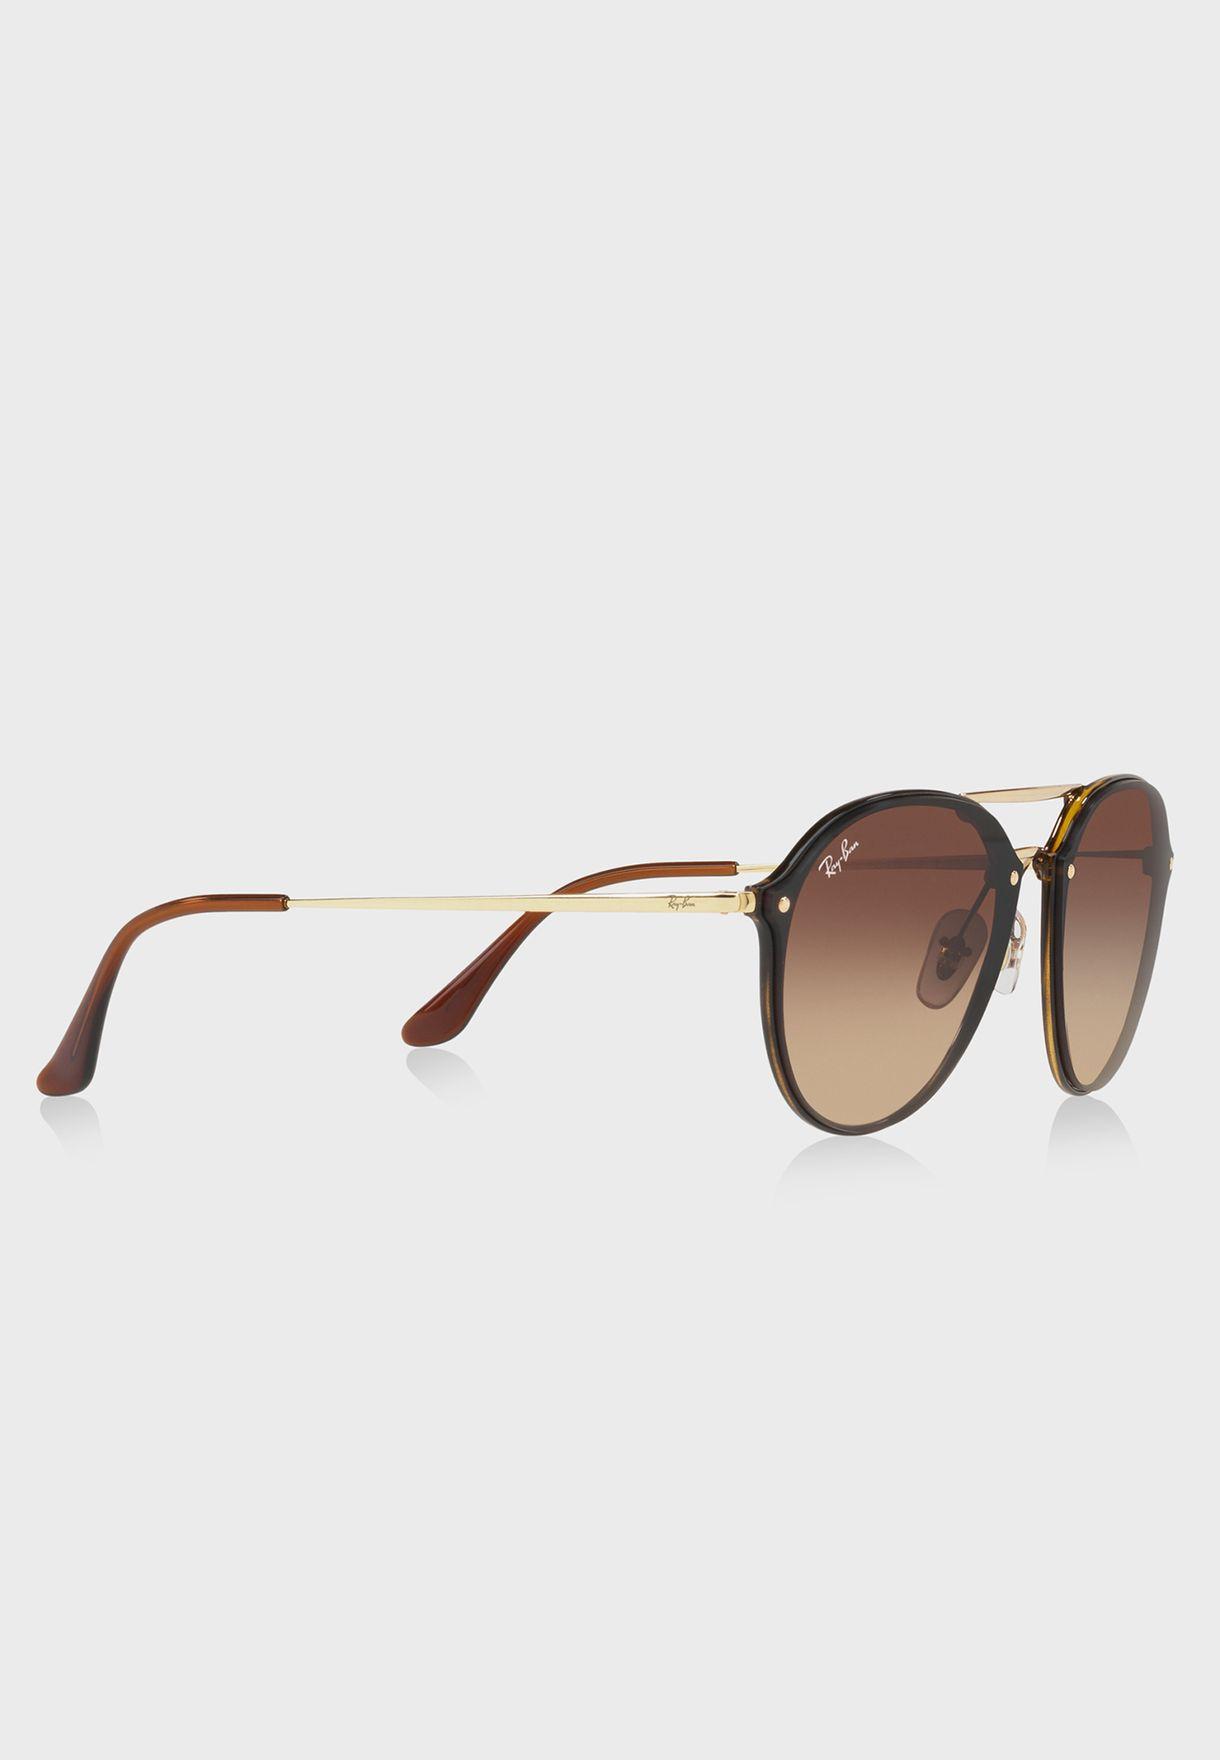 484dc2f53cb Shop Ray-Ban gold Double Bridge Sunglasses 8053672837865 for Men in ...